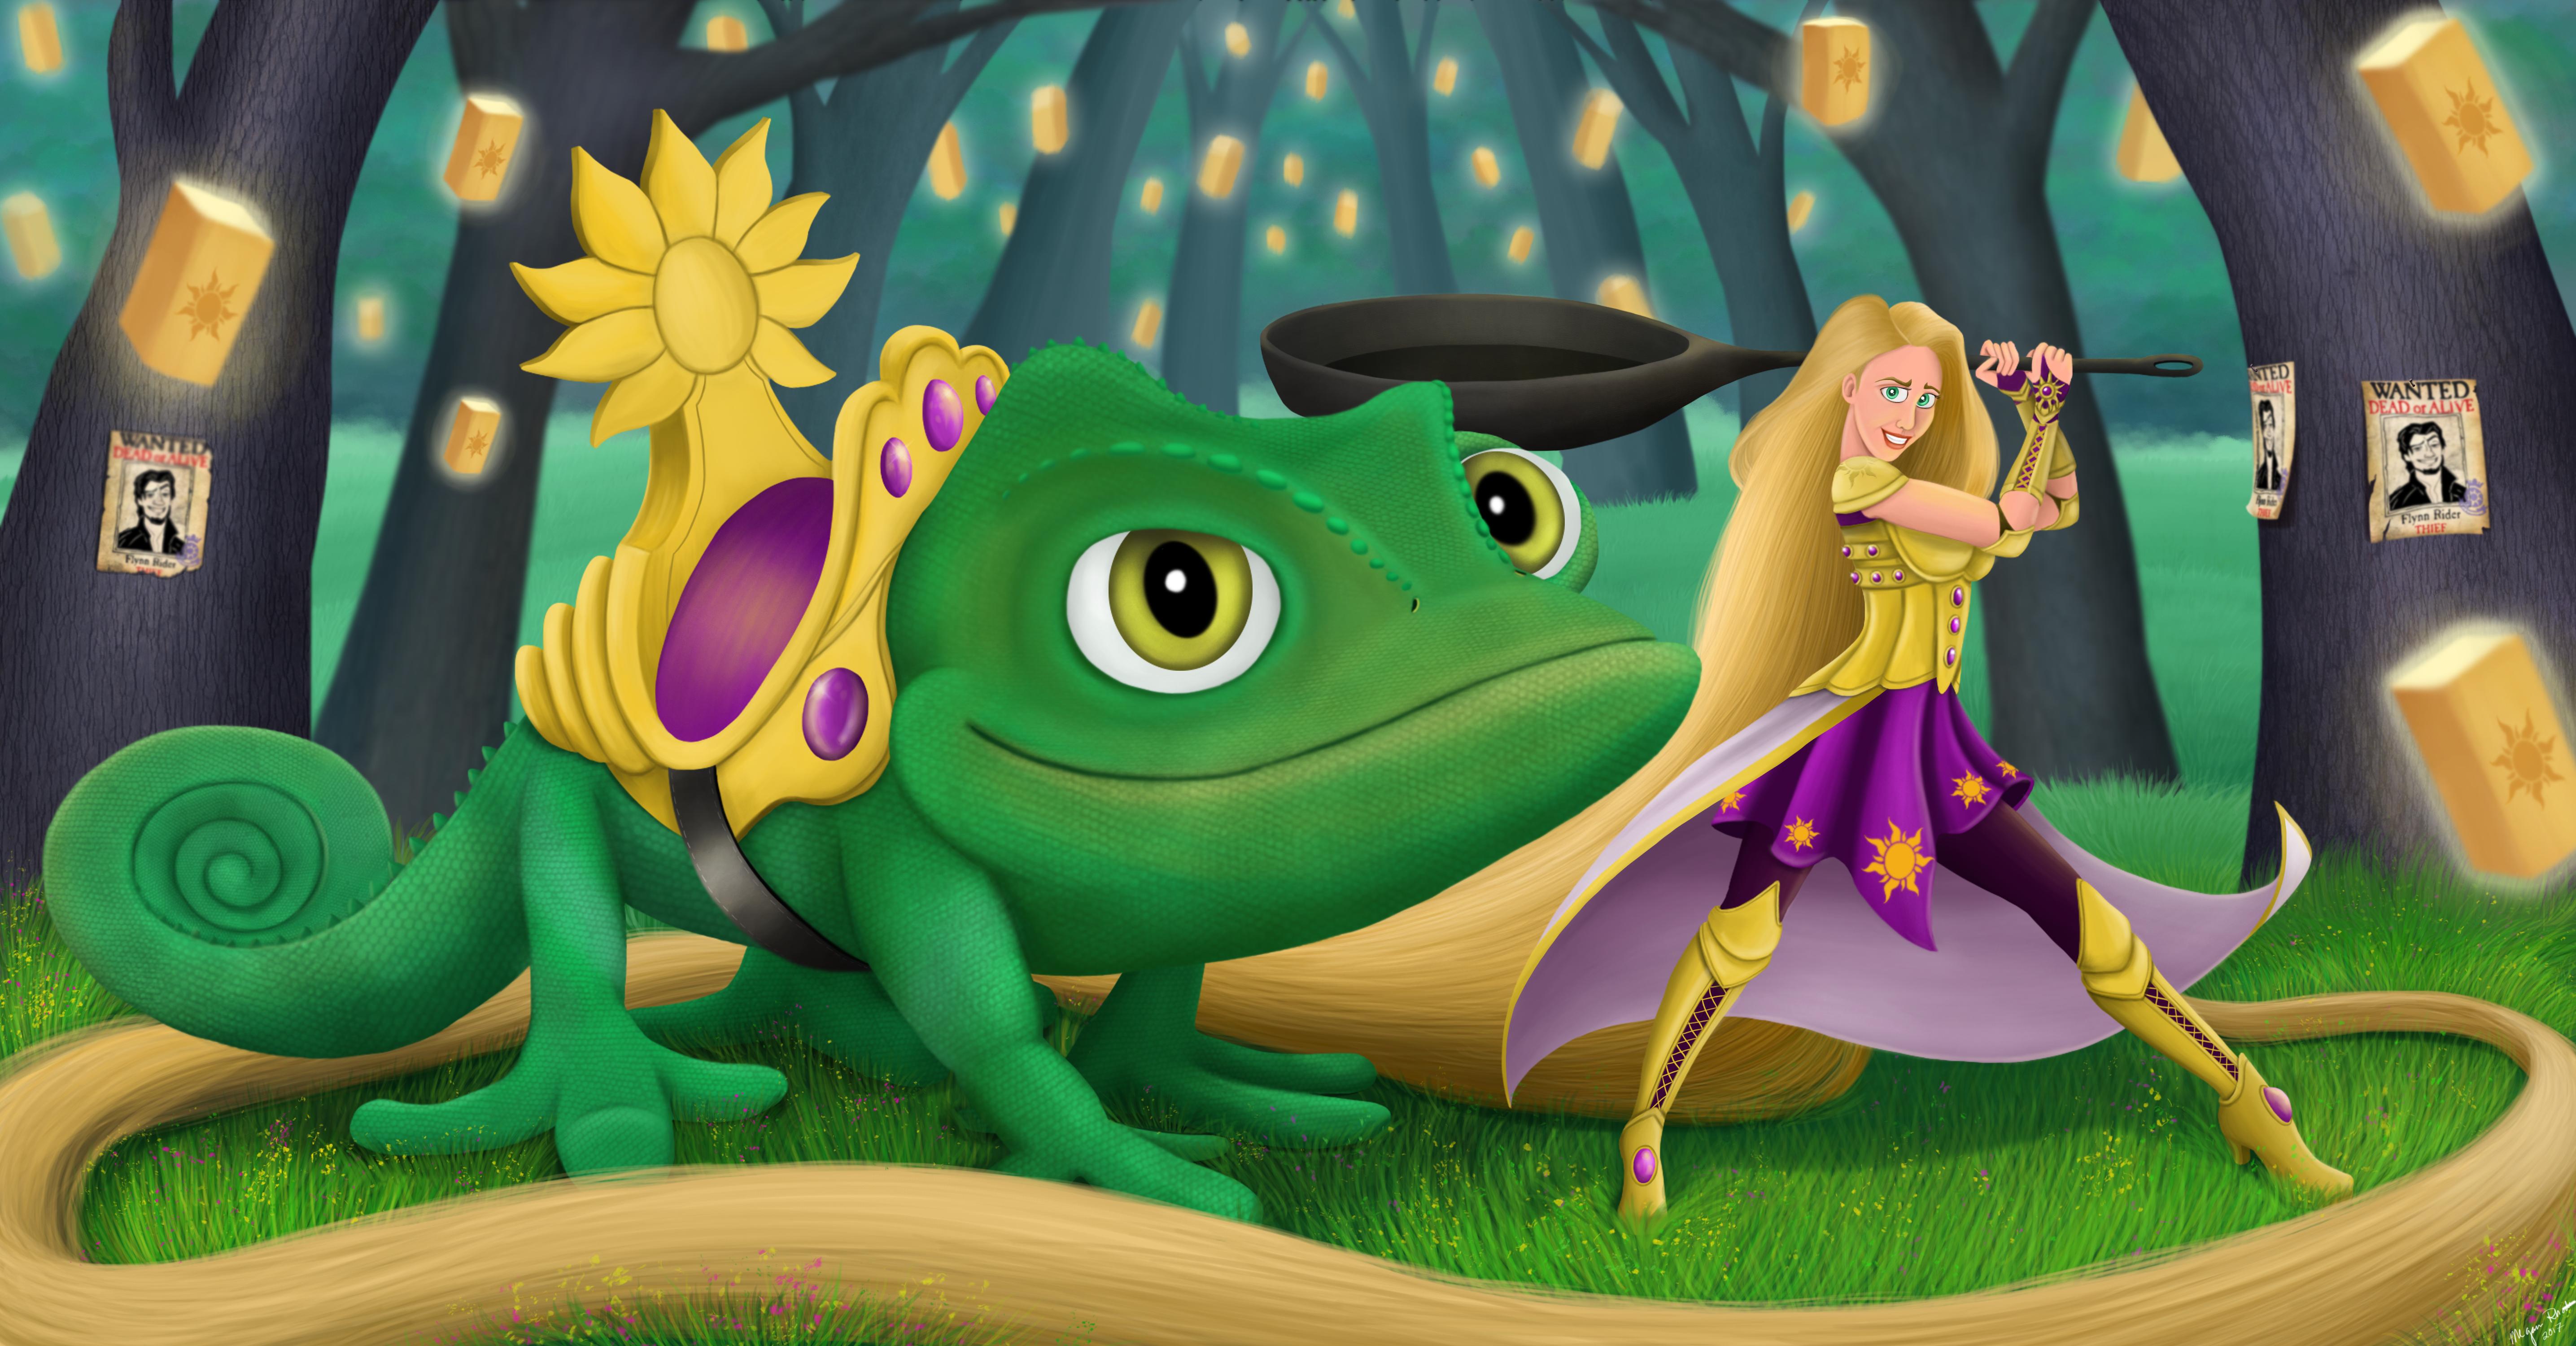 LVL 99 Rapunzel and Pascal